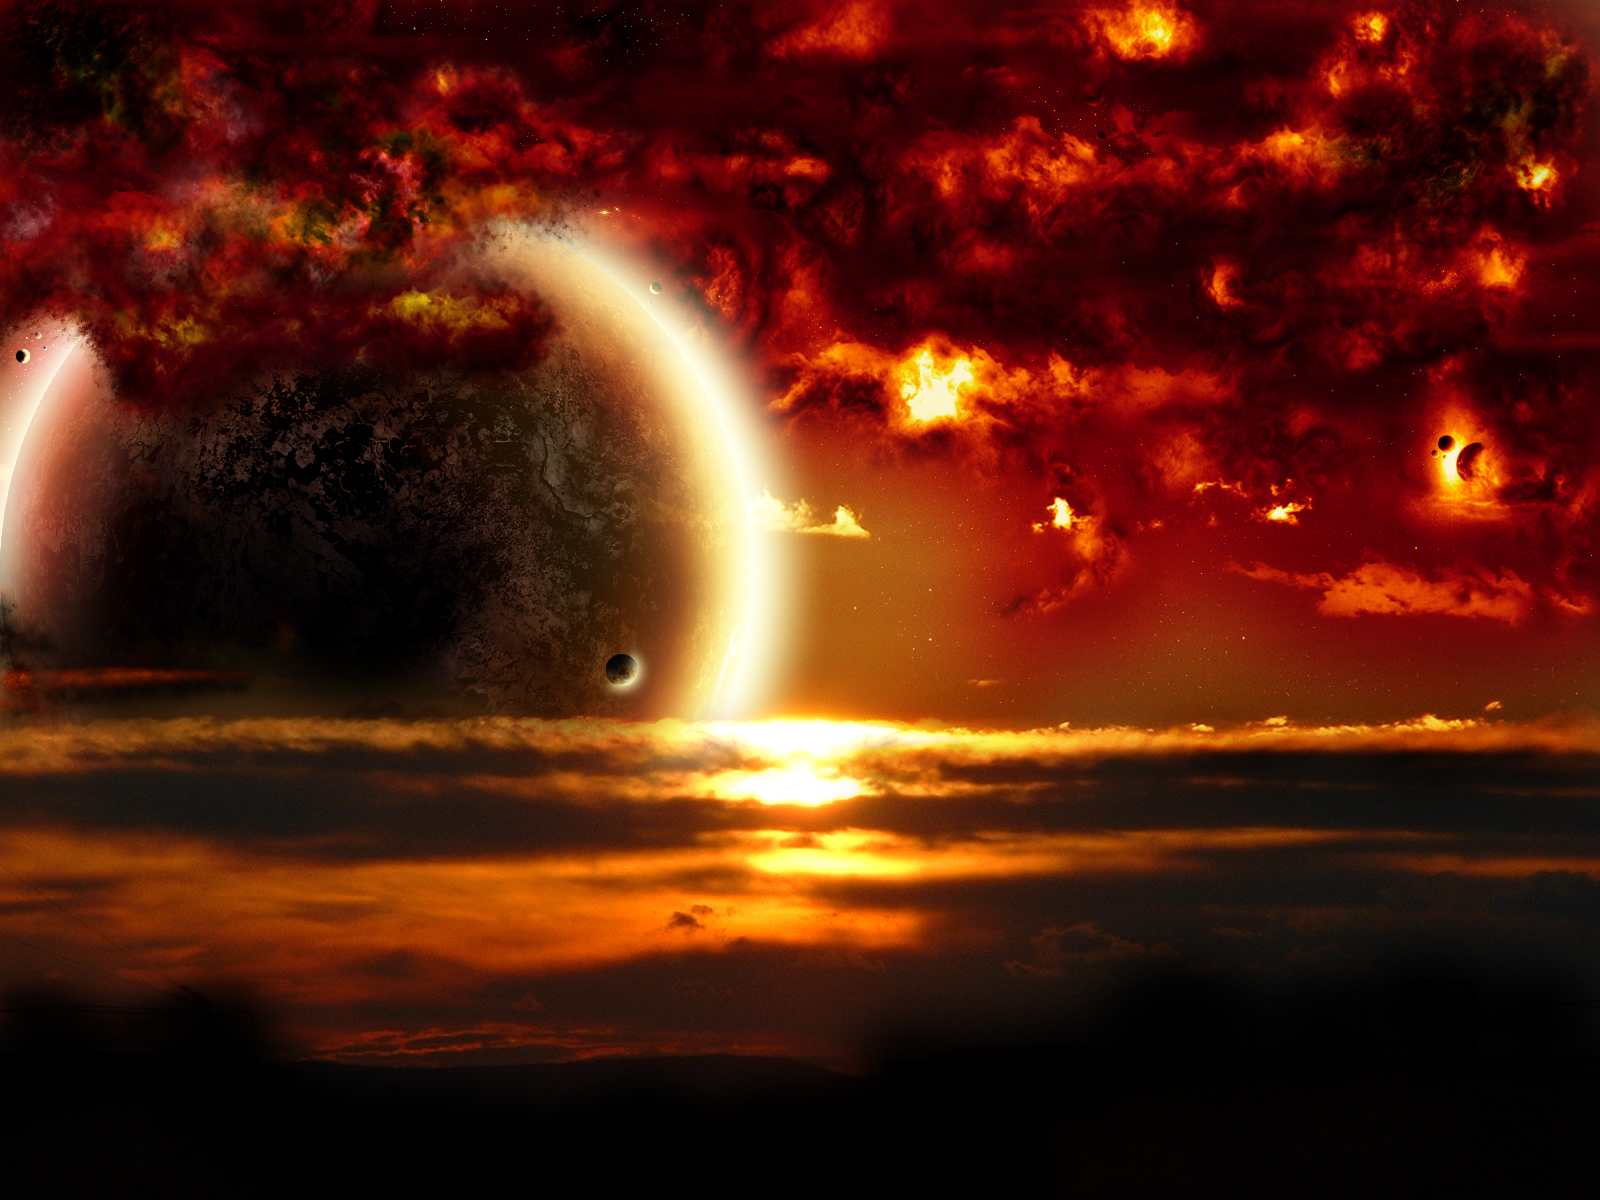 http://2.bp.blogspot.com/-aaVSS8313eM/UNUcpqkZCKI/AAAAAAAAEzo/-cm00b8zqO0/s1600/Wallpaper+Planetas+-+Pixel+Create+3.jpg